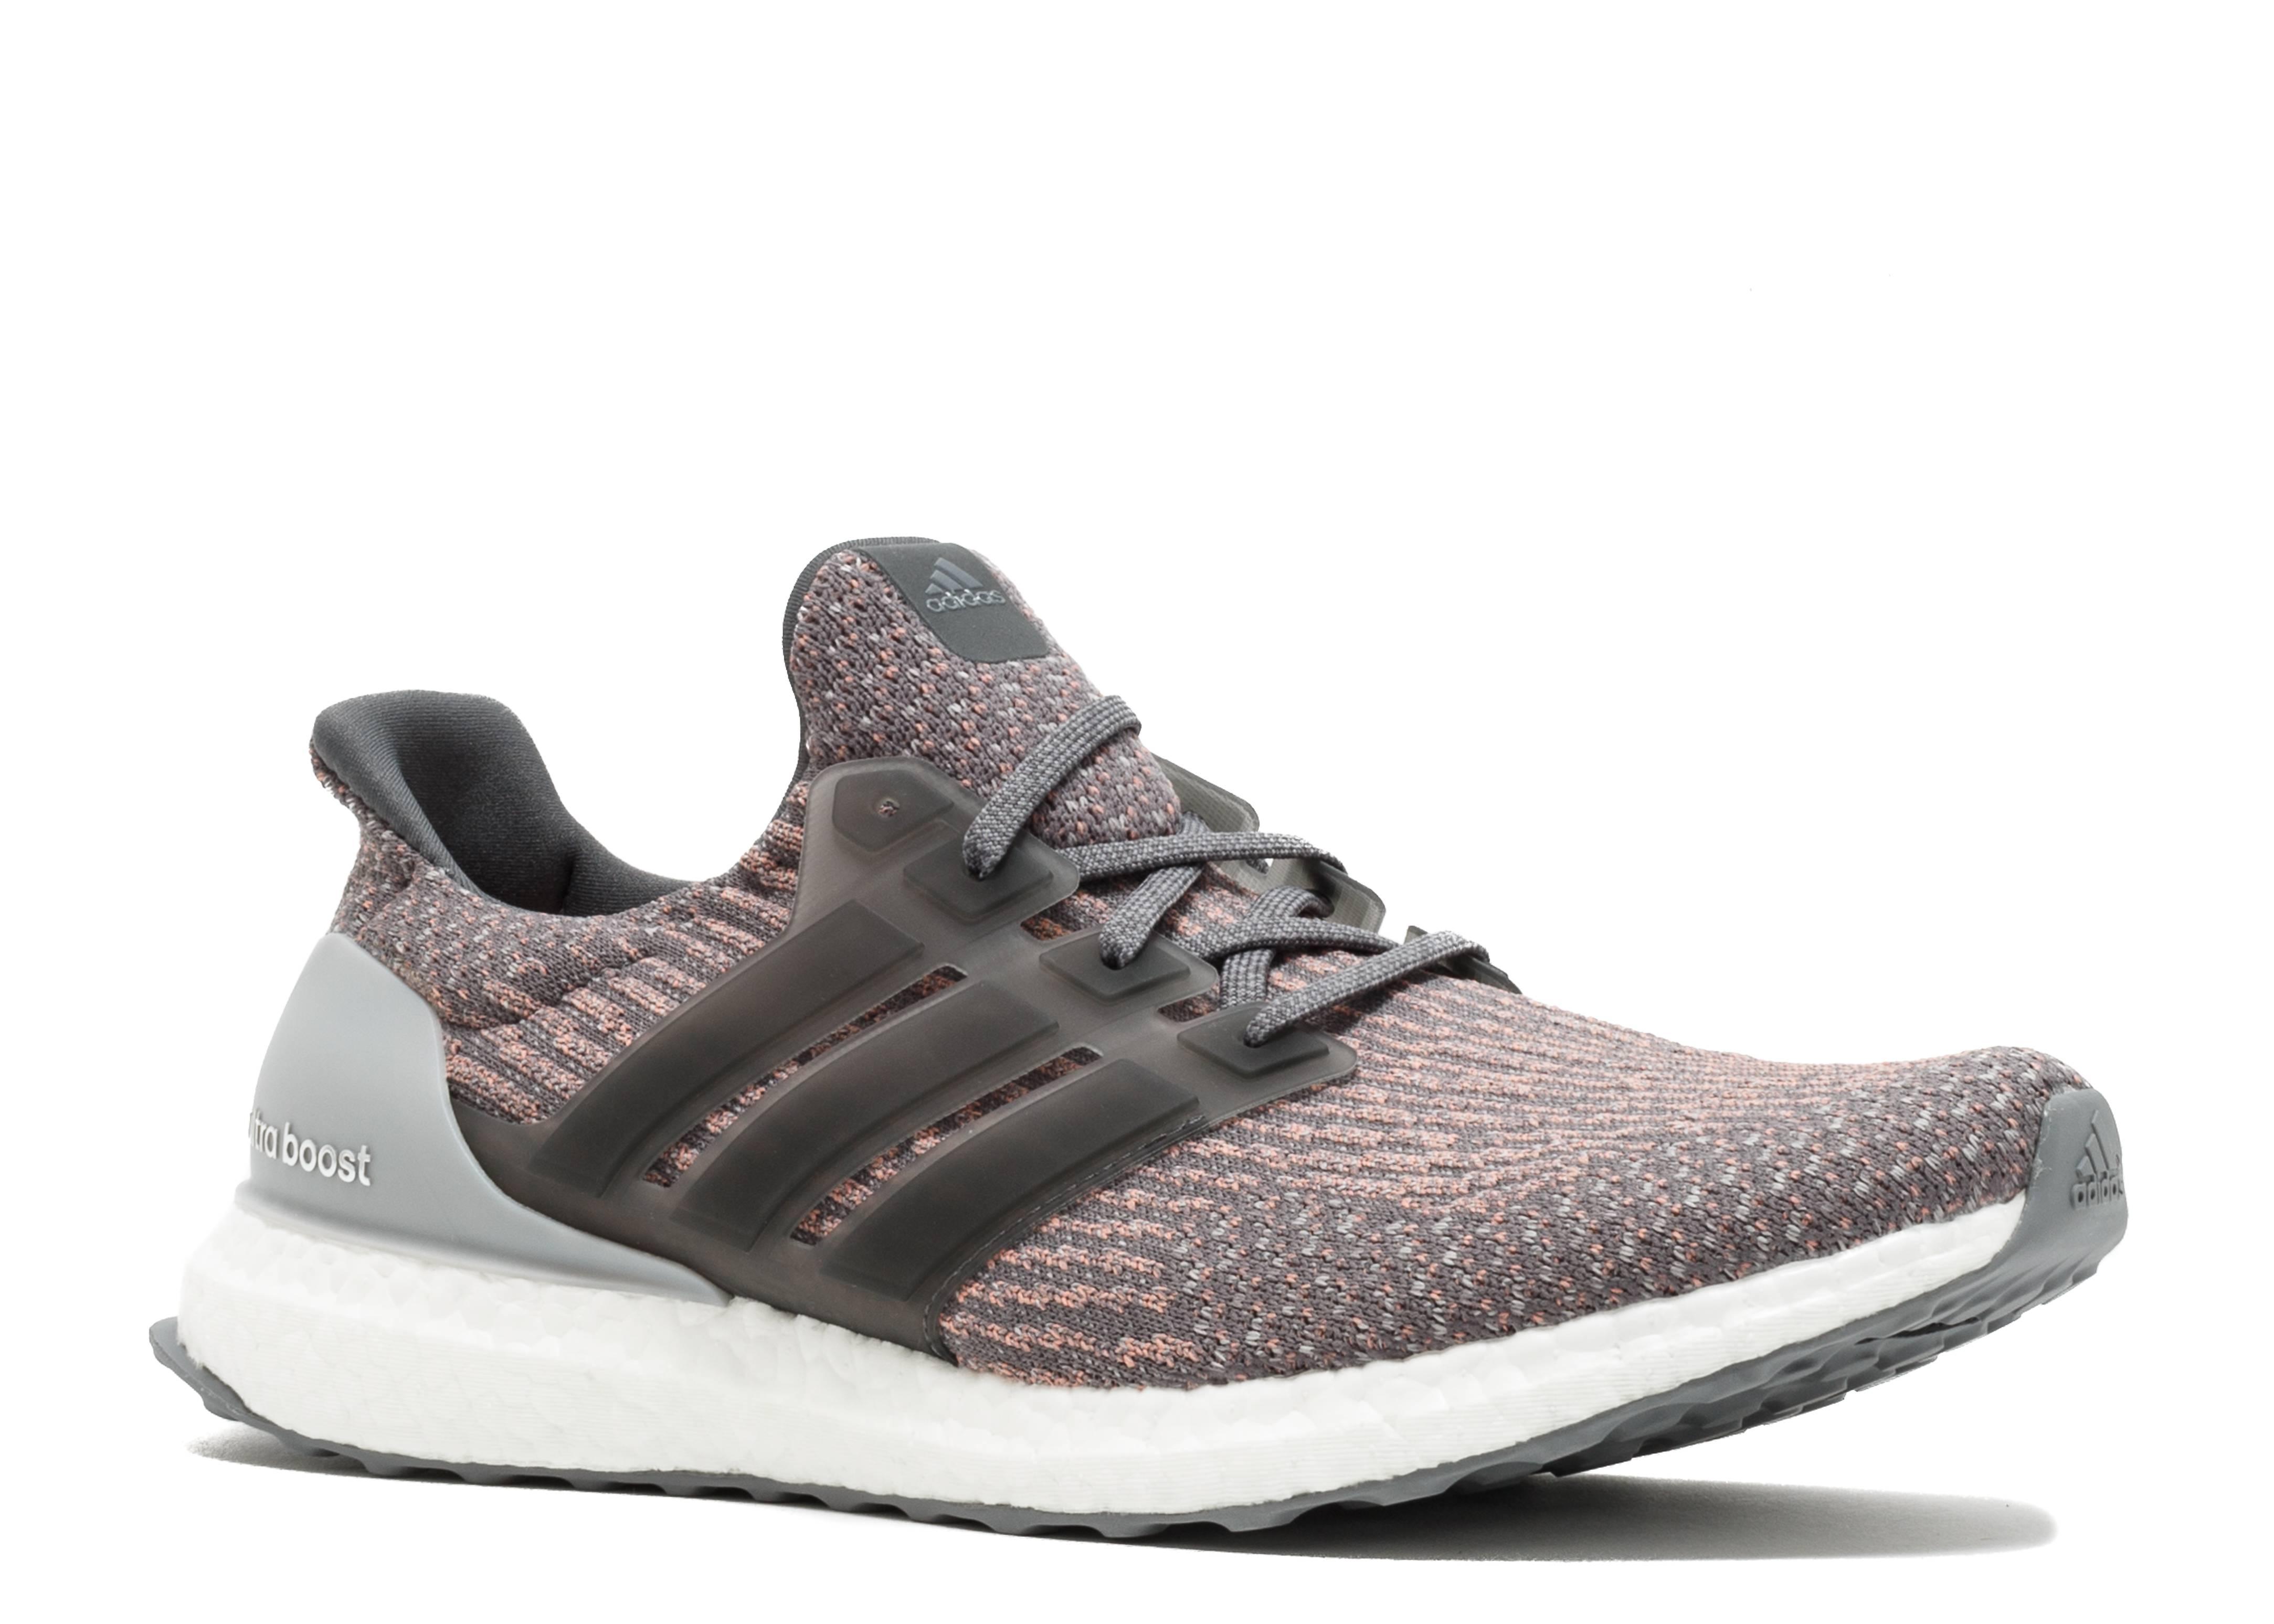 938ac98d5dde5 Ultra Boost - Adidas - s82022 - grey four grey four trace pink ...